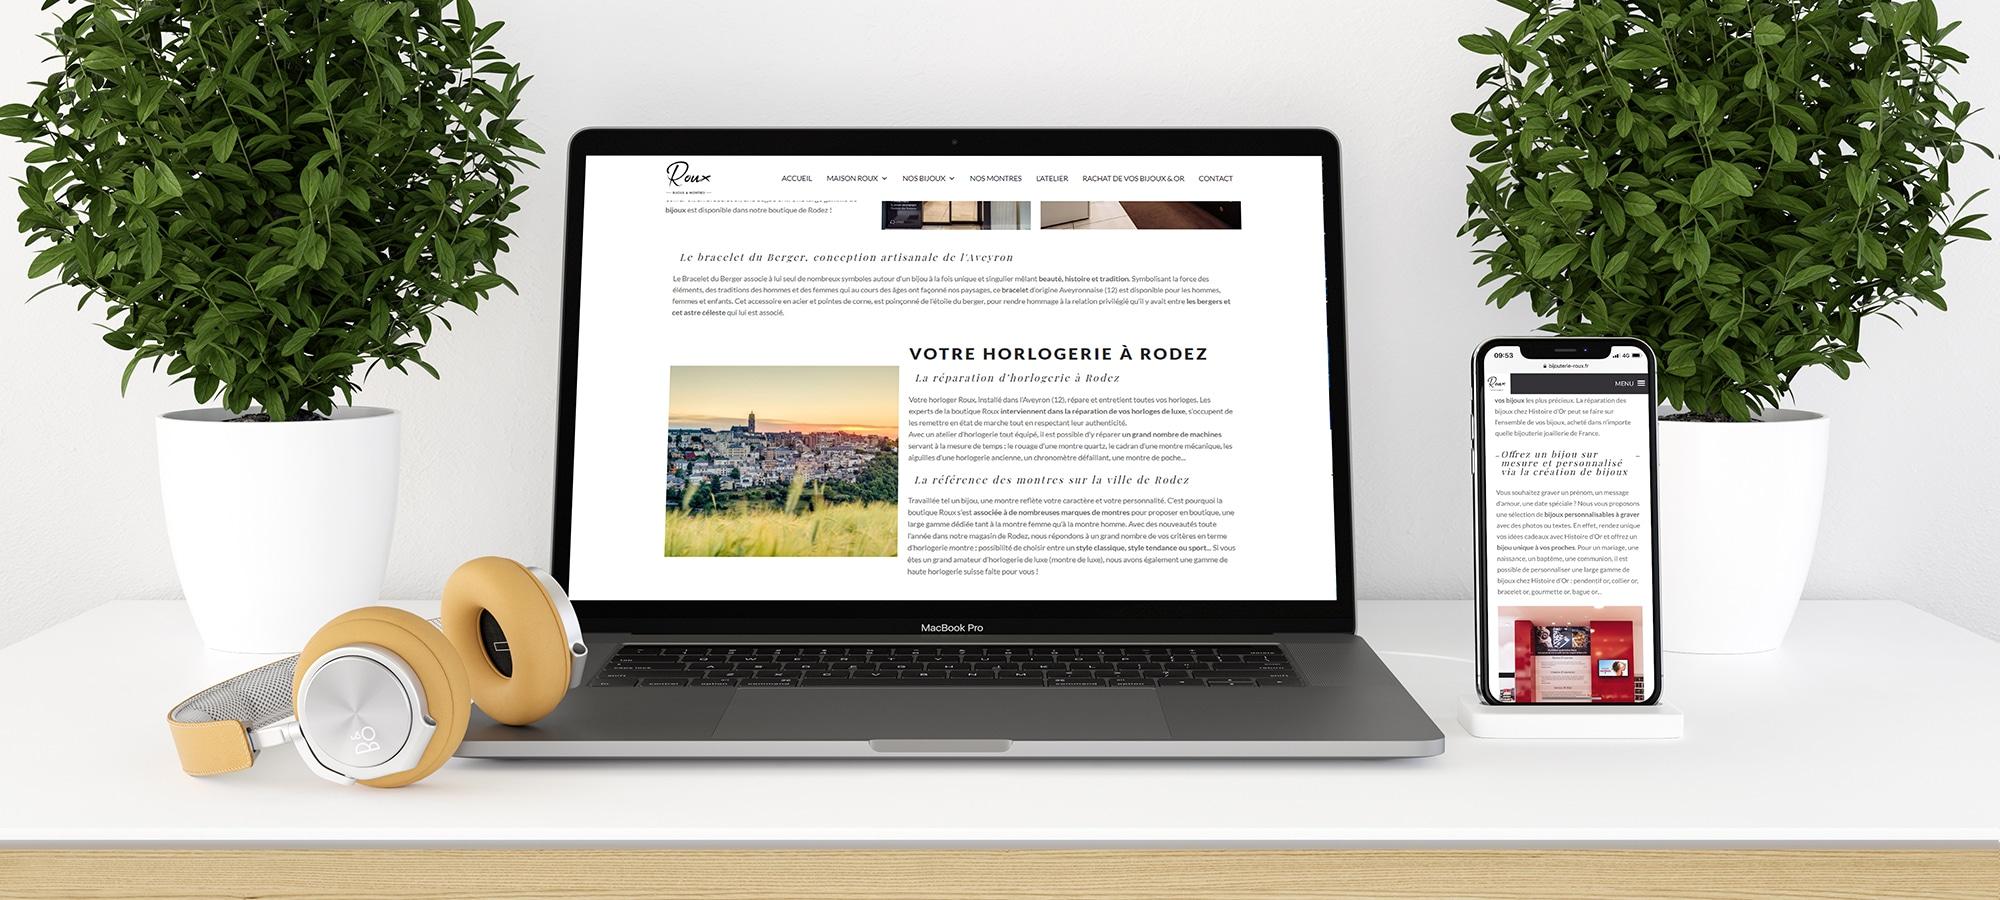 bijouterie-roux-site-ecommerce-vitrine-cyberscope